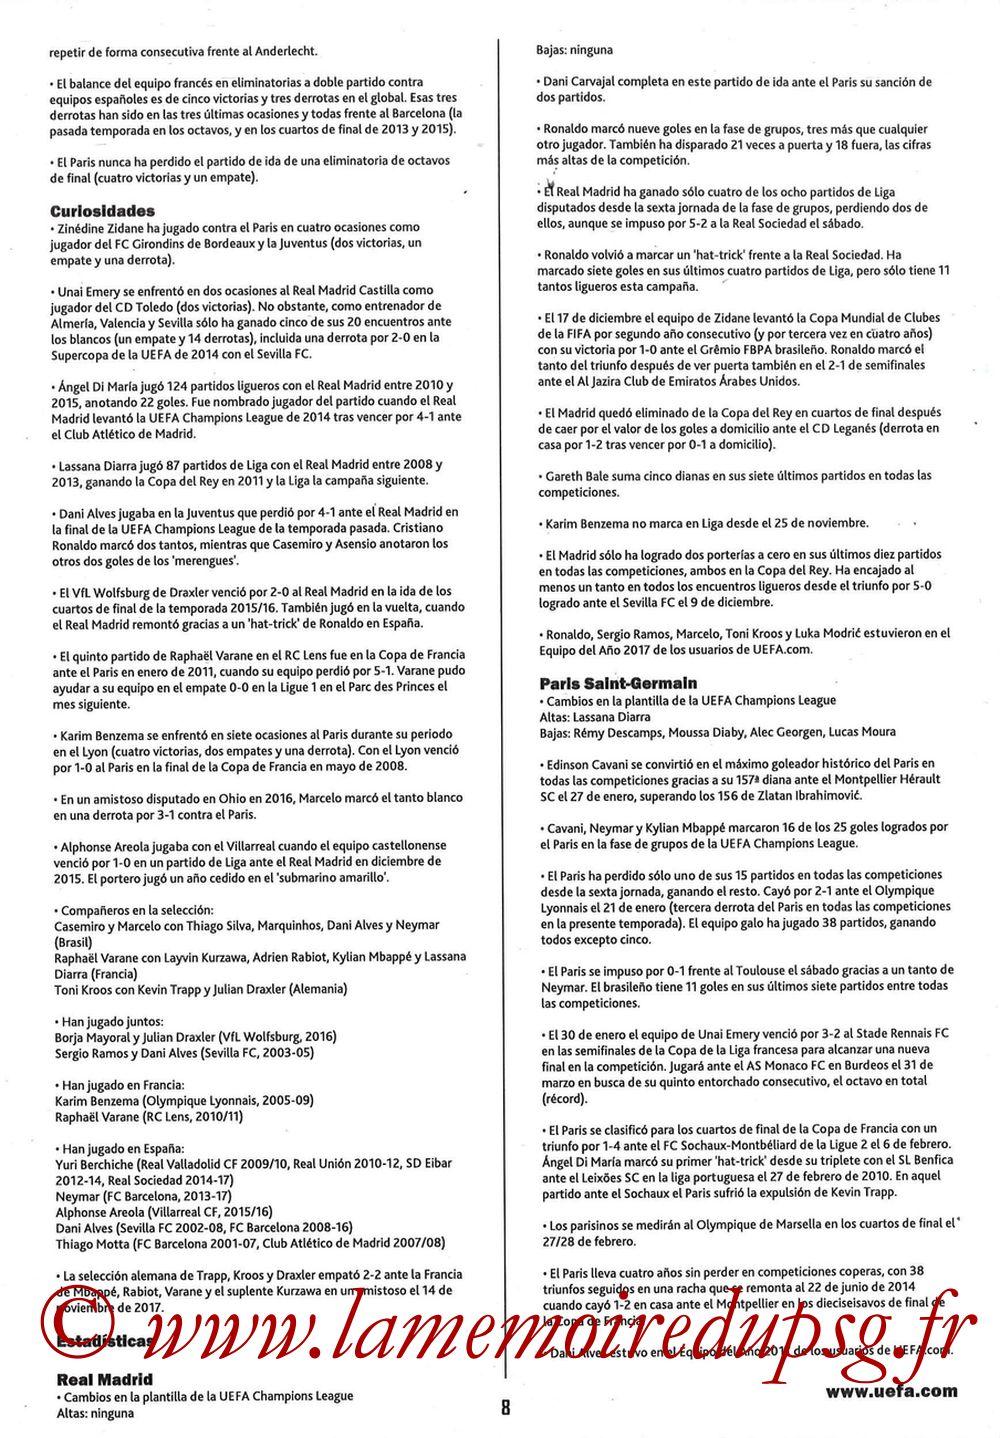 2018-02-14  Real Madrid-PSG (8ème C1 aller, Programme pirate) - Page 08